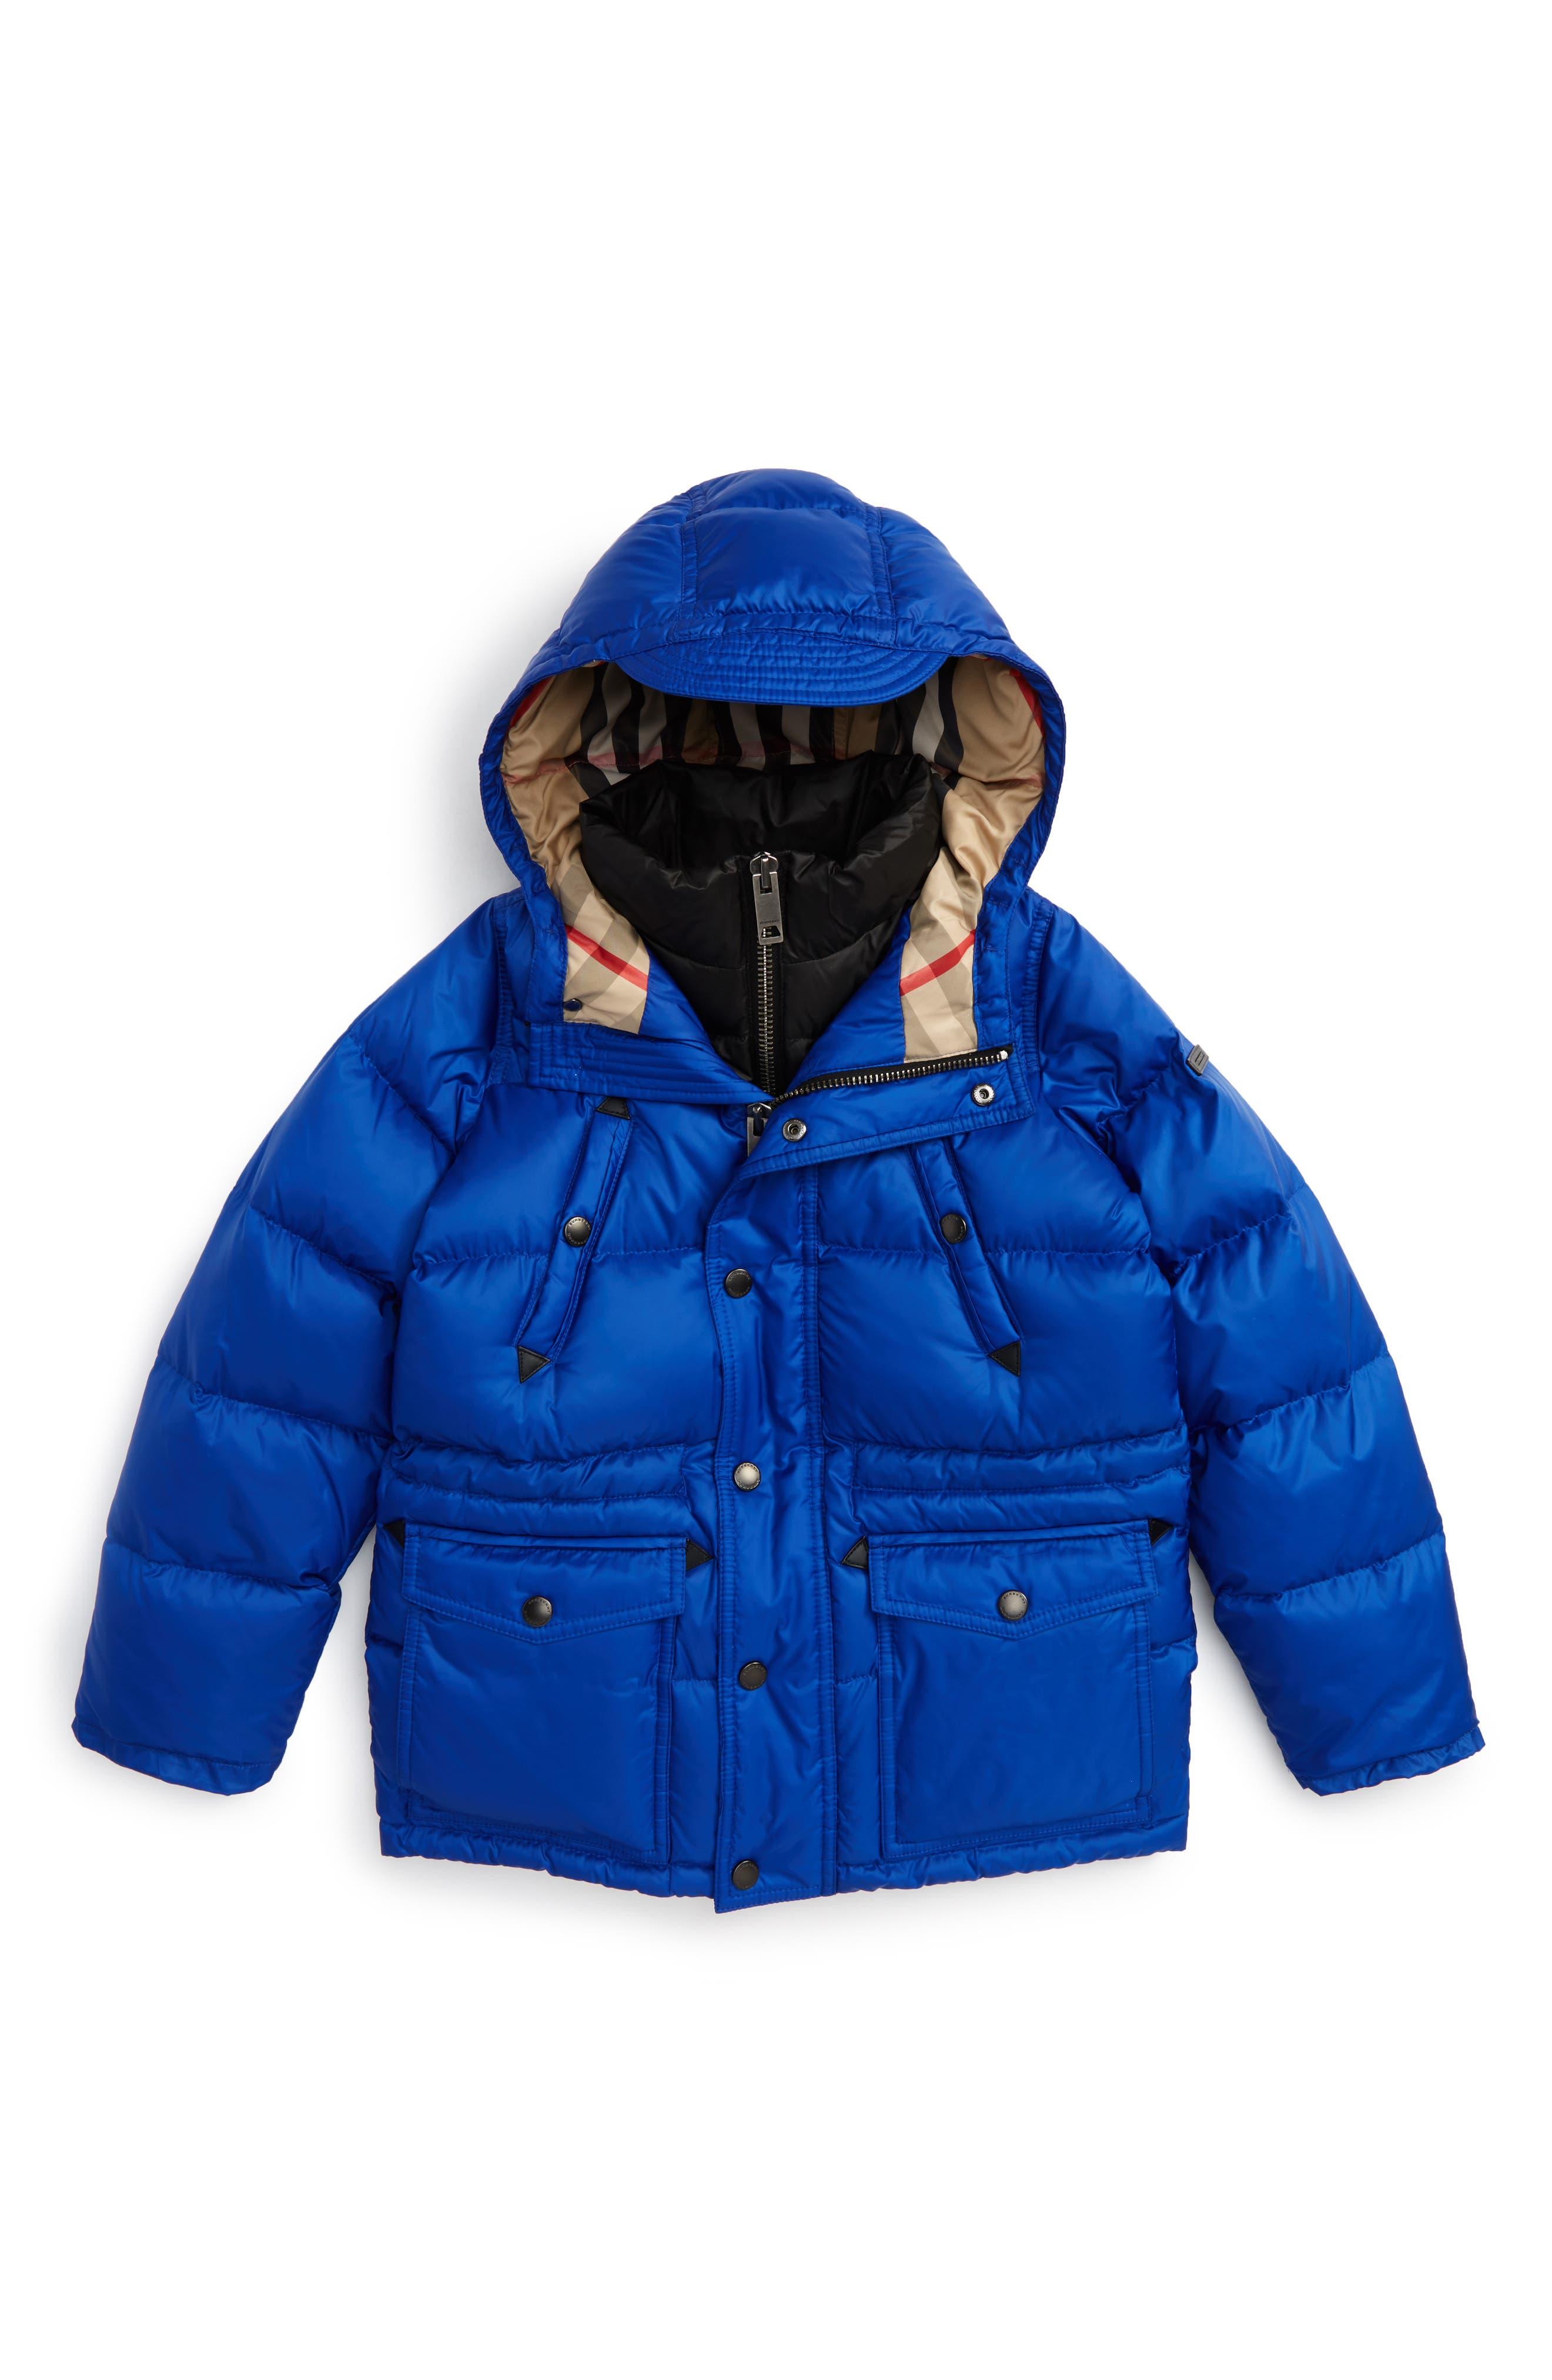 Main Image - Burberry Petter Hooded Down Puffer Jacket (Little Boys & Big Boys)